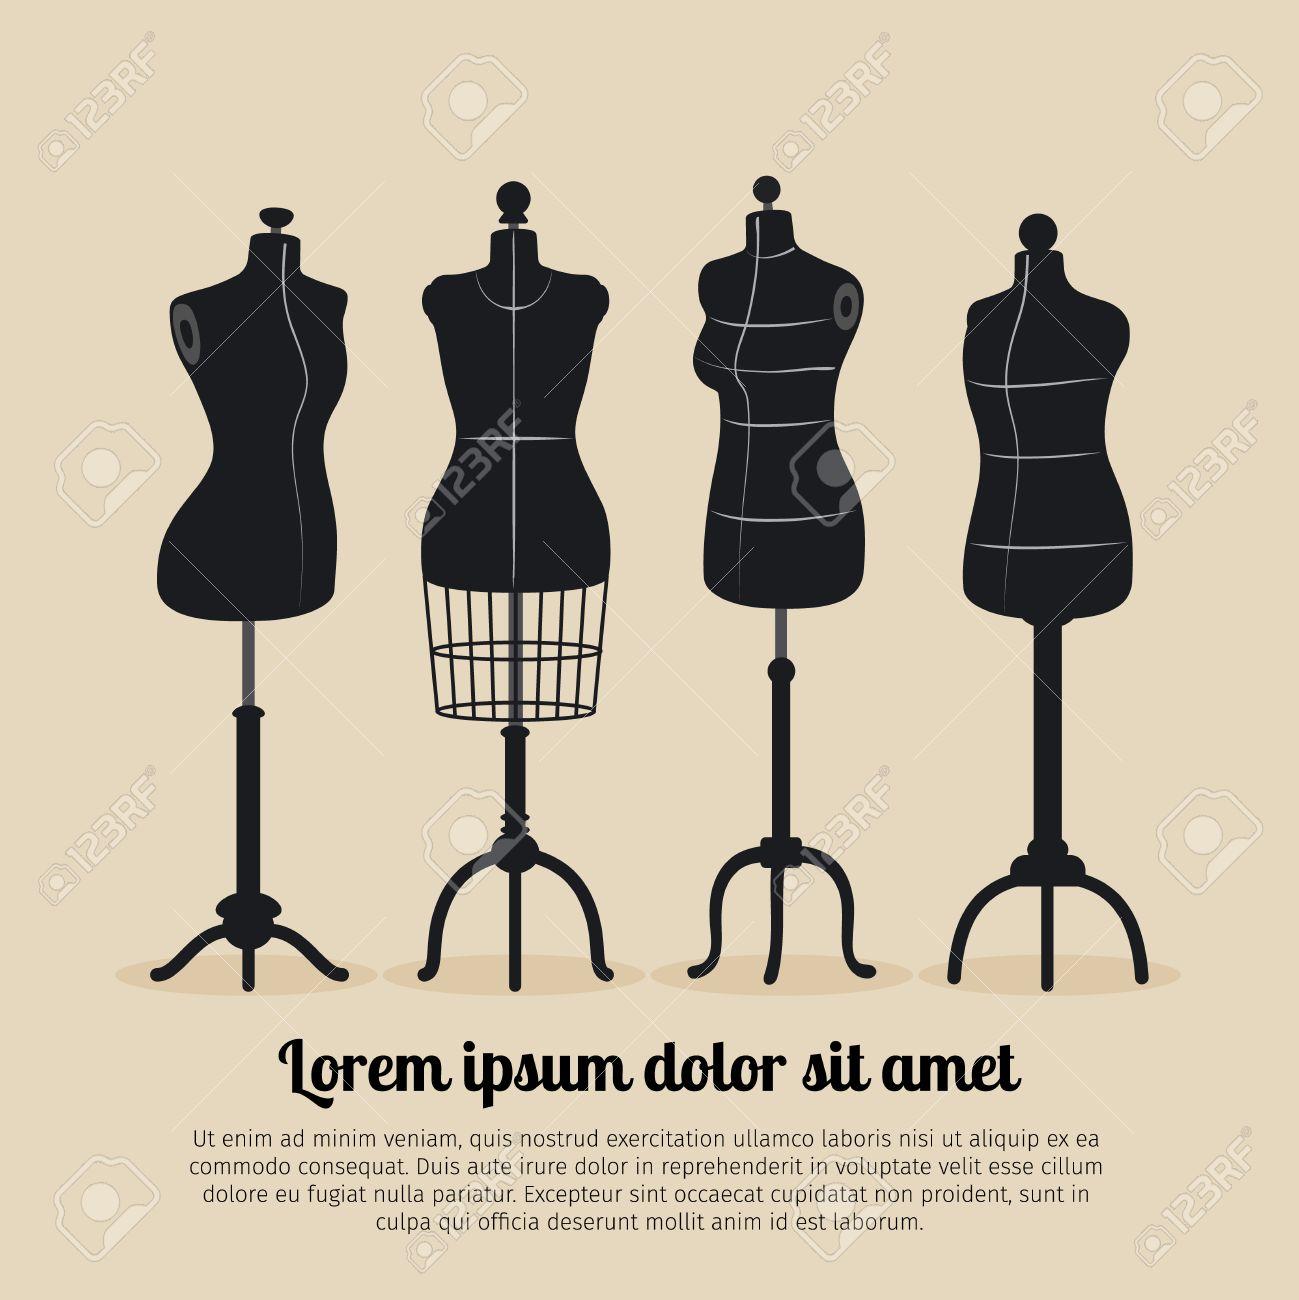 Female body vintage mannequin set. Tailors mannequins illustration - 56382088